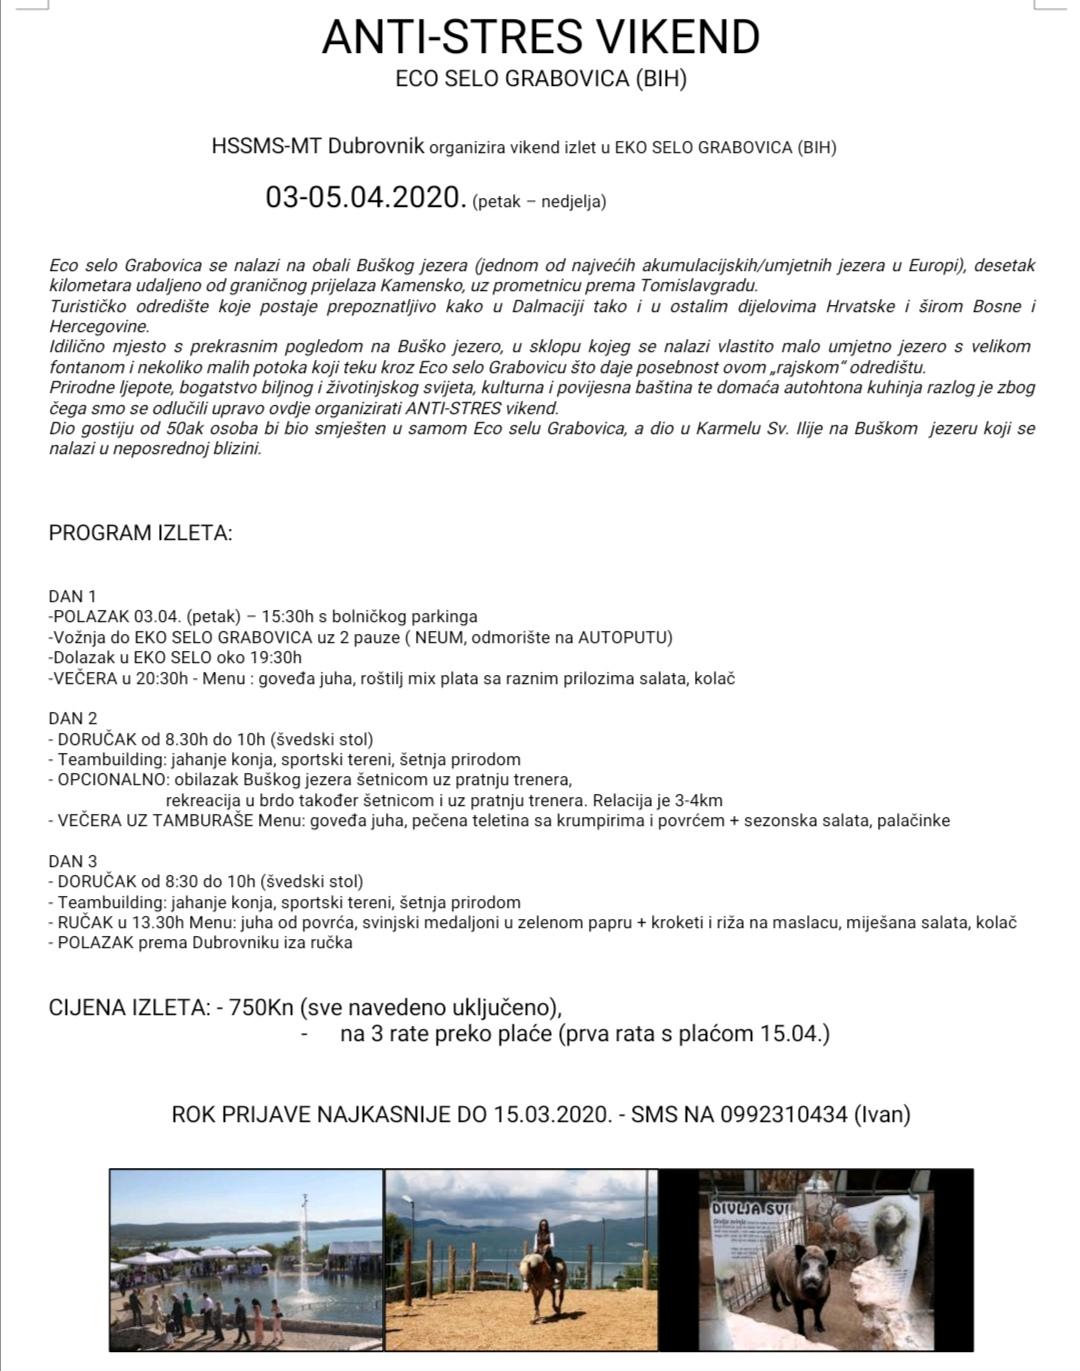 ANTI-STRES VIKEND – EKO SELO GRABOVICA 03.-05.04.